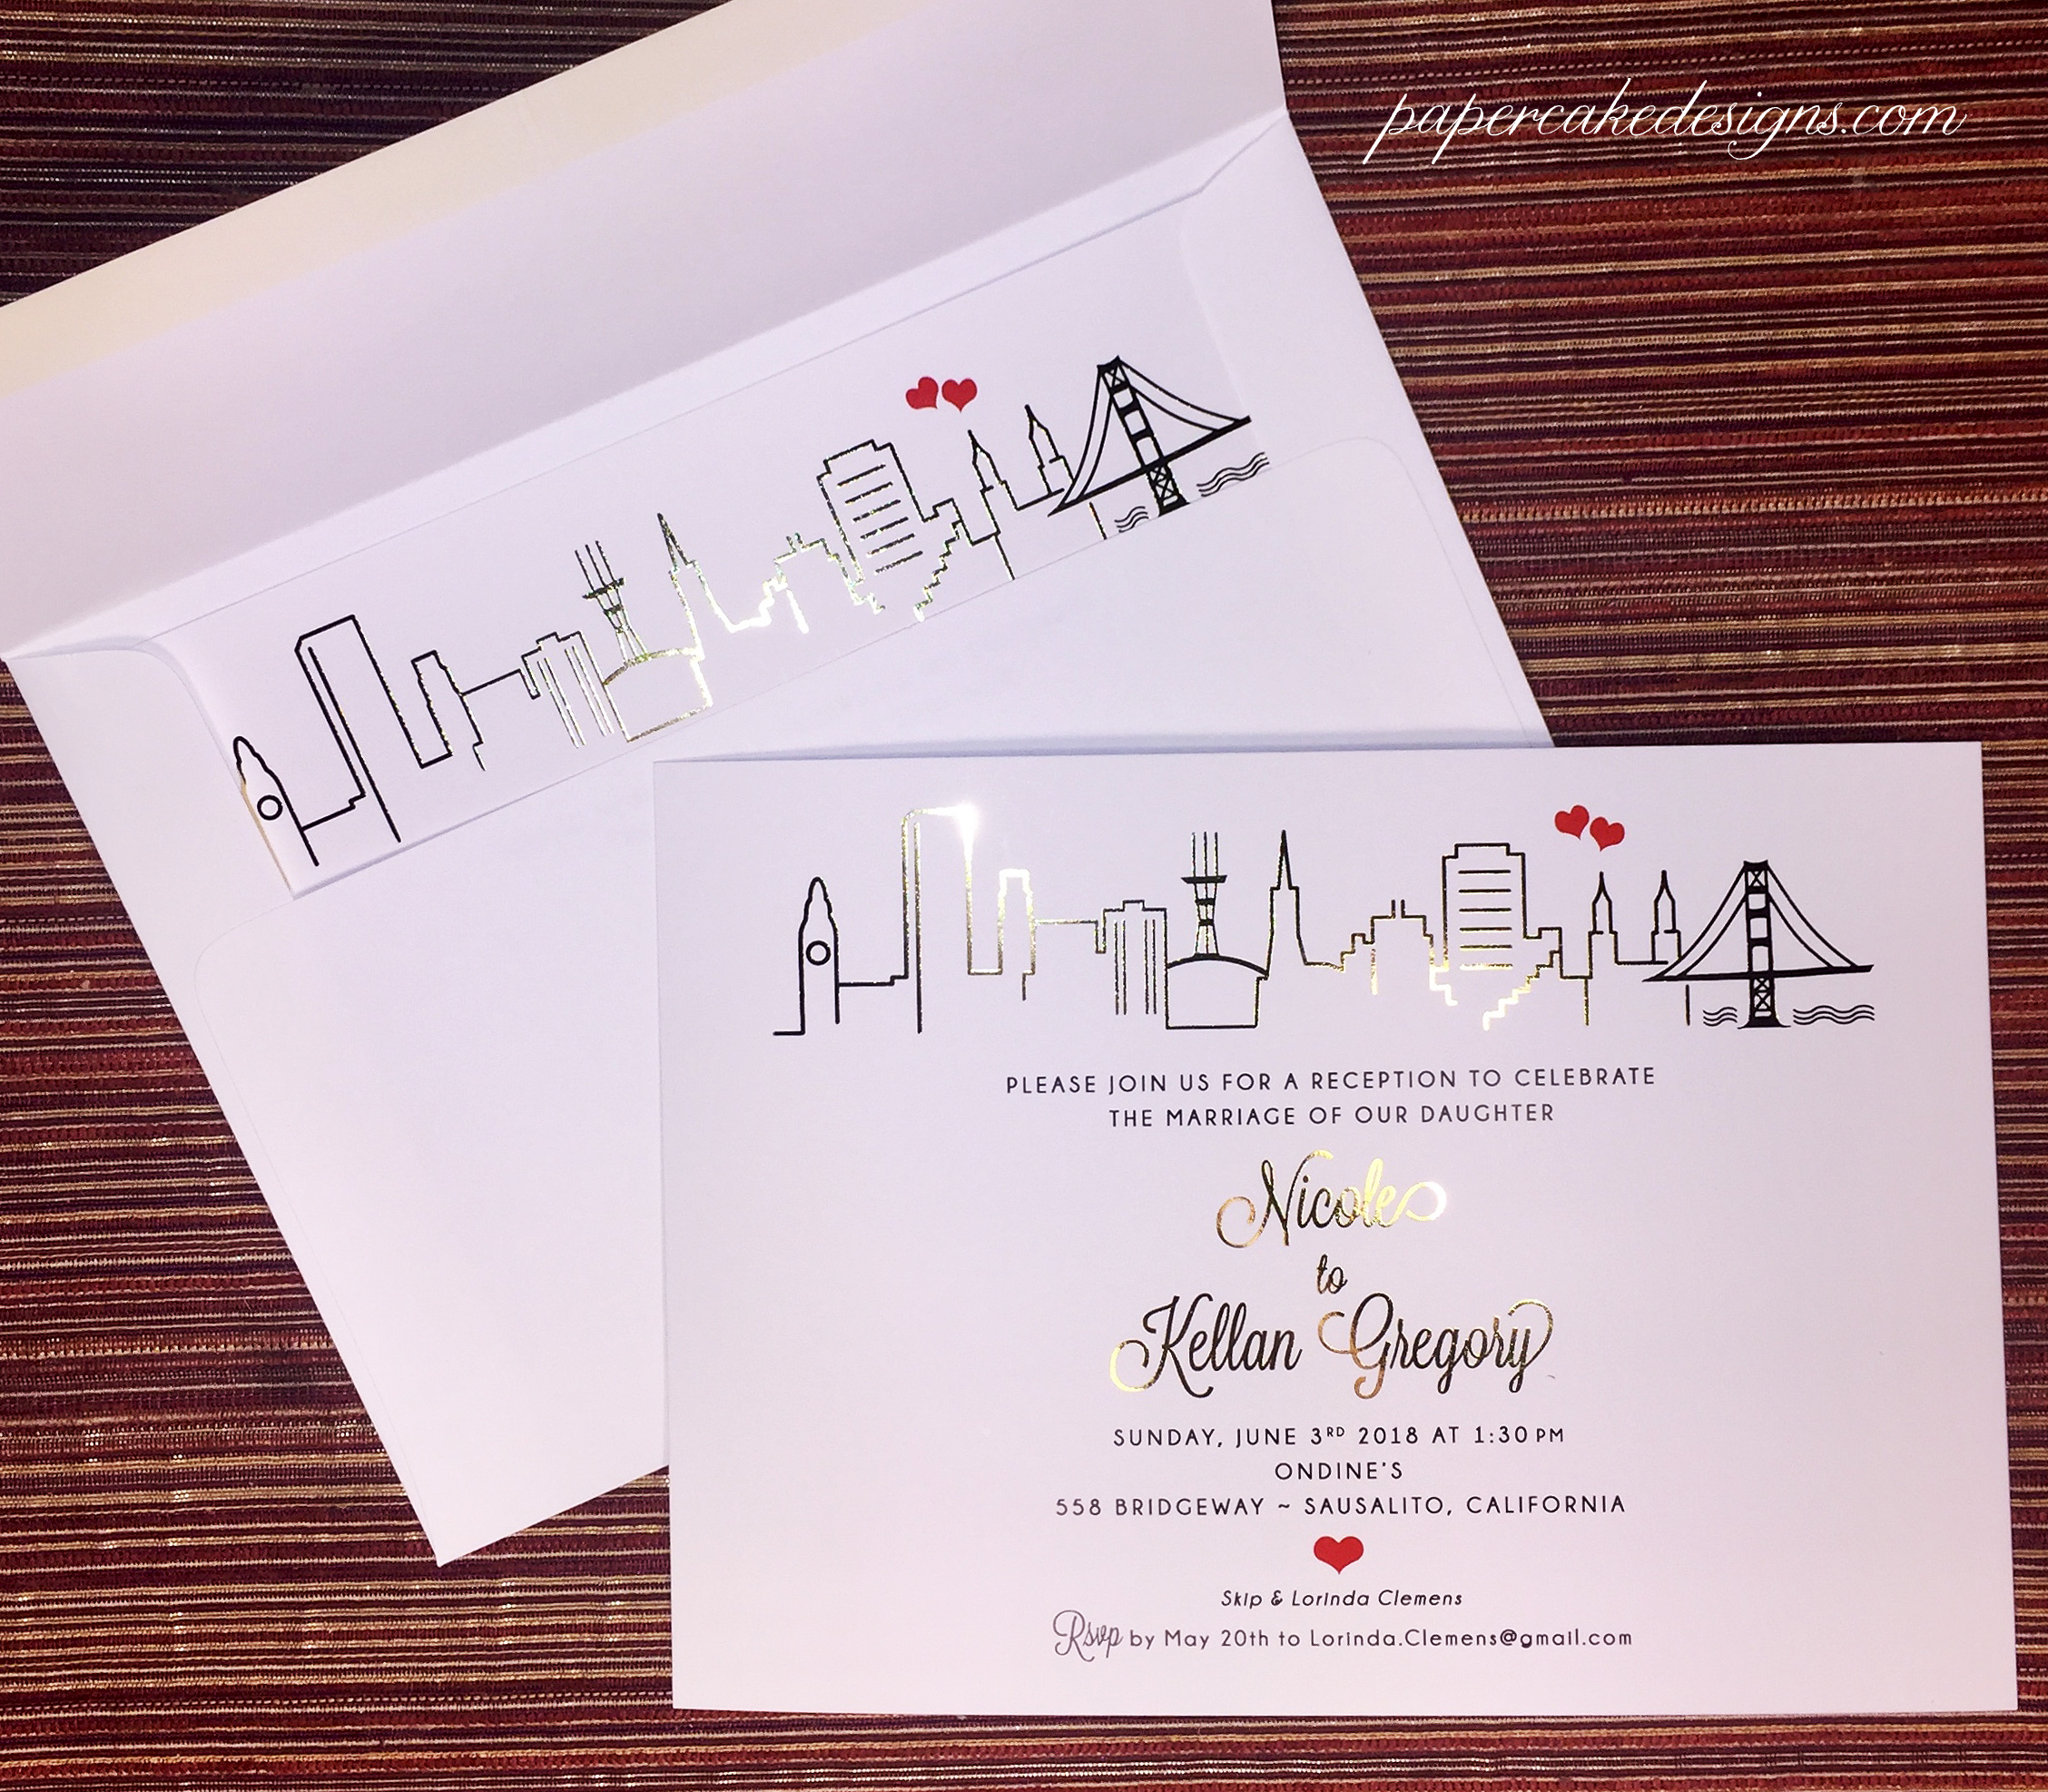 papercake designs a custom wedding invitation stationery graphic